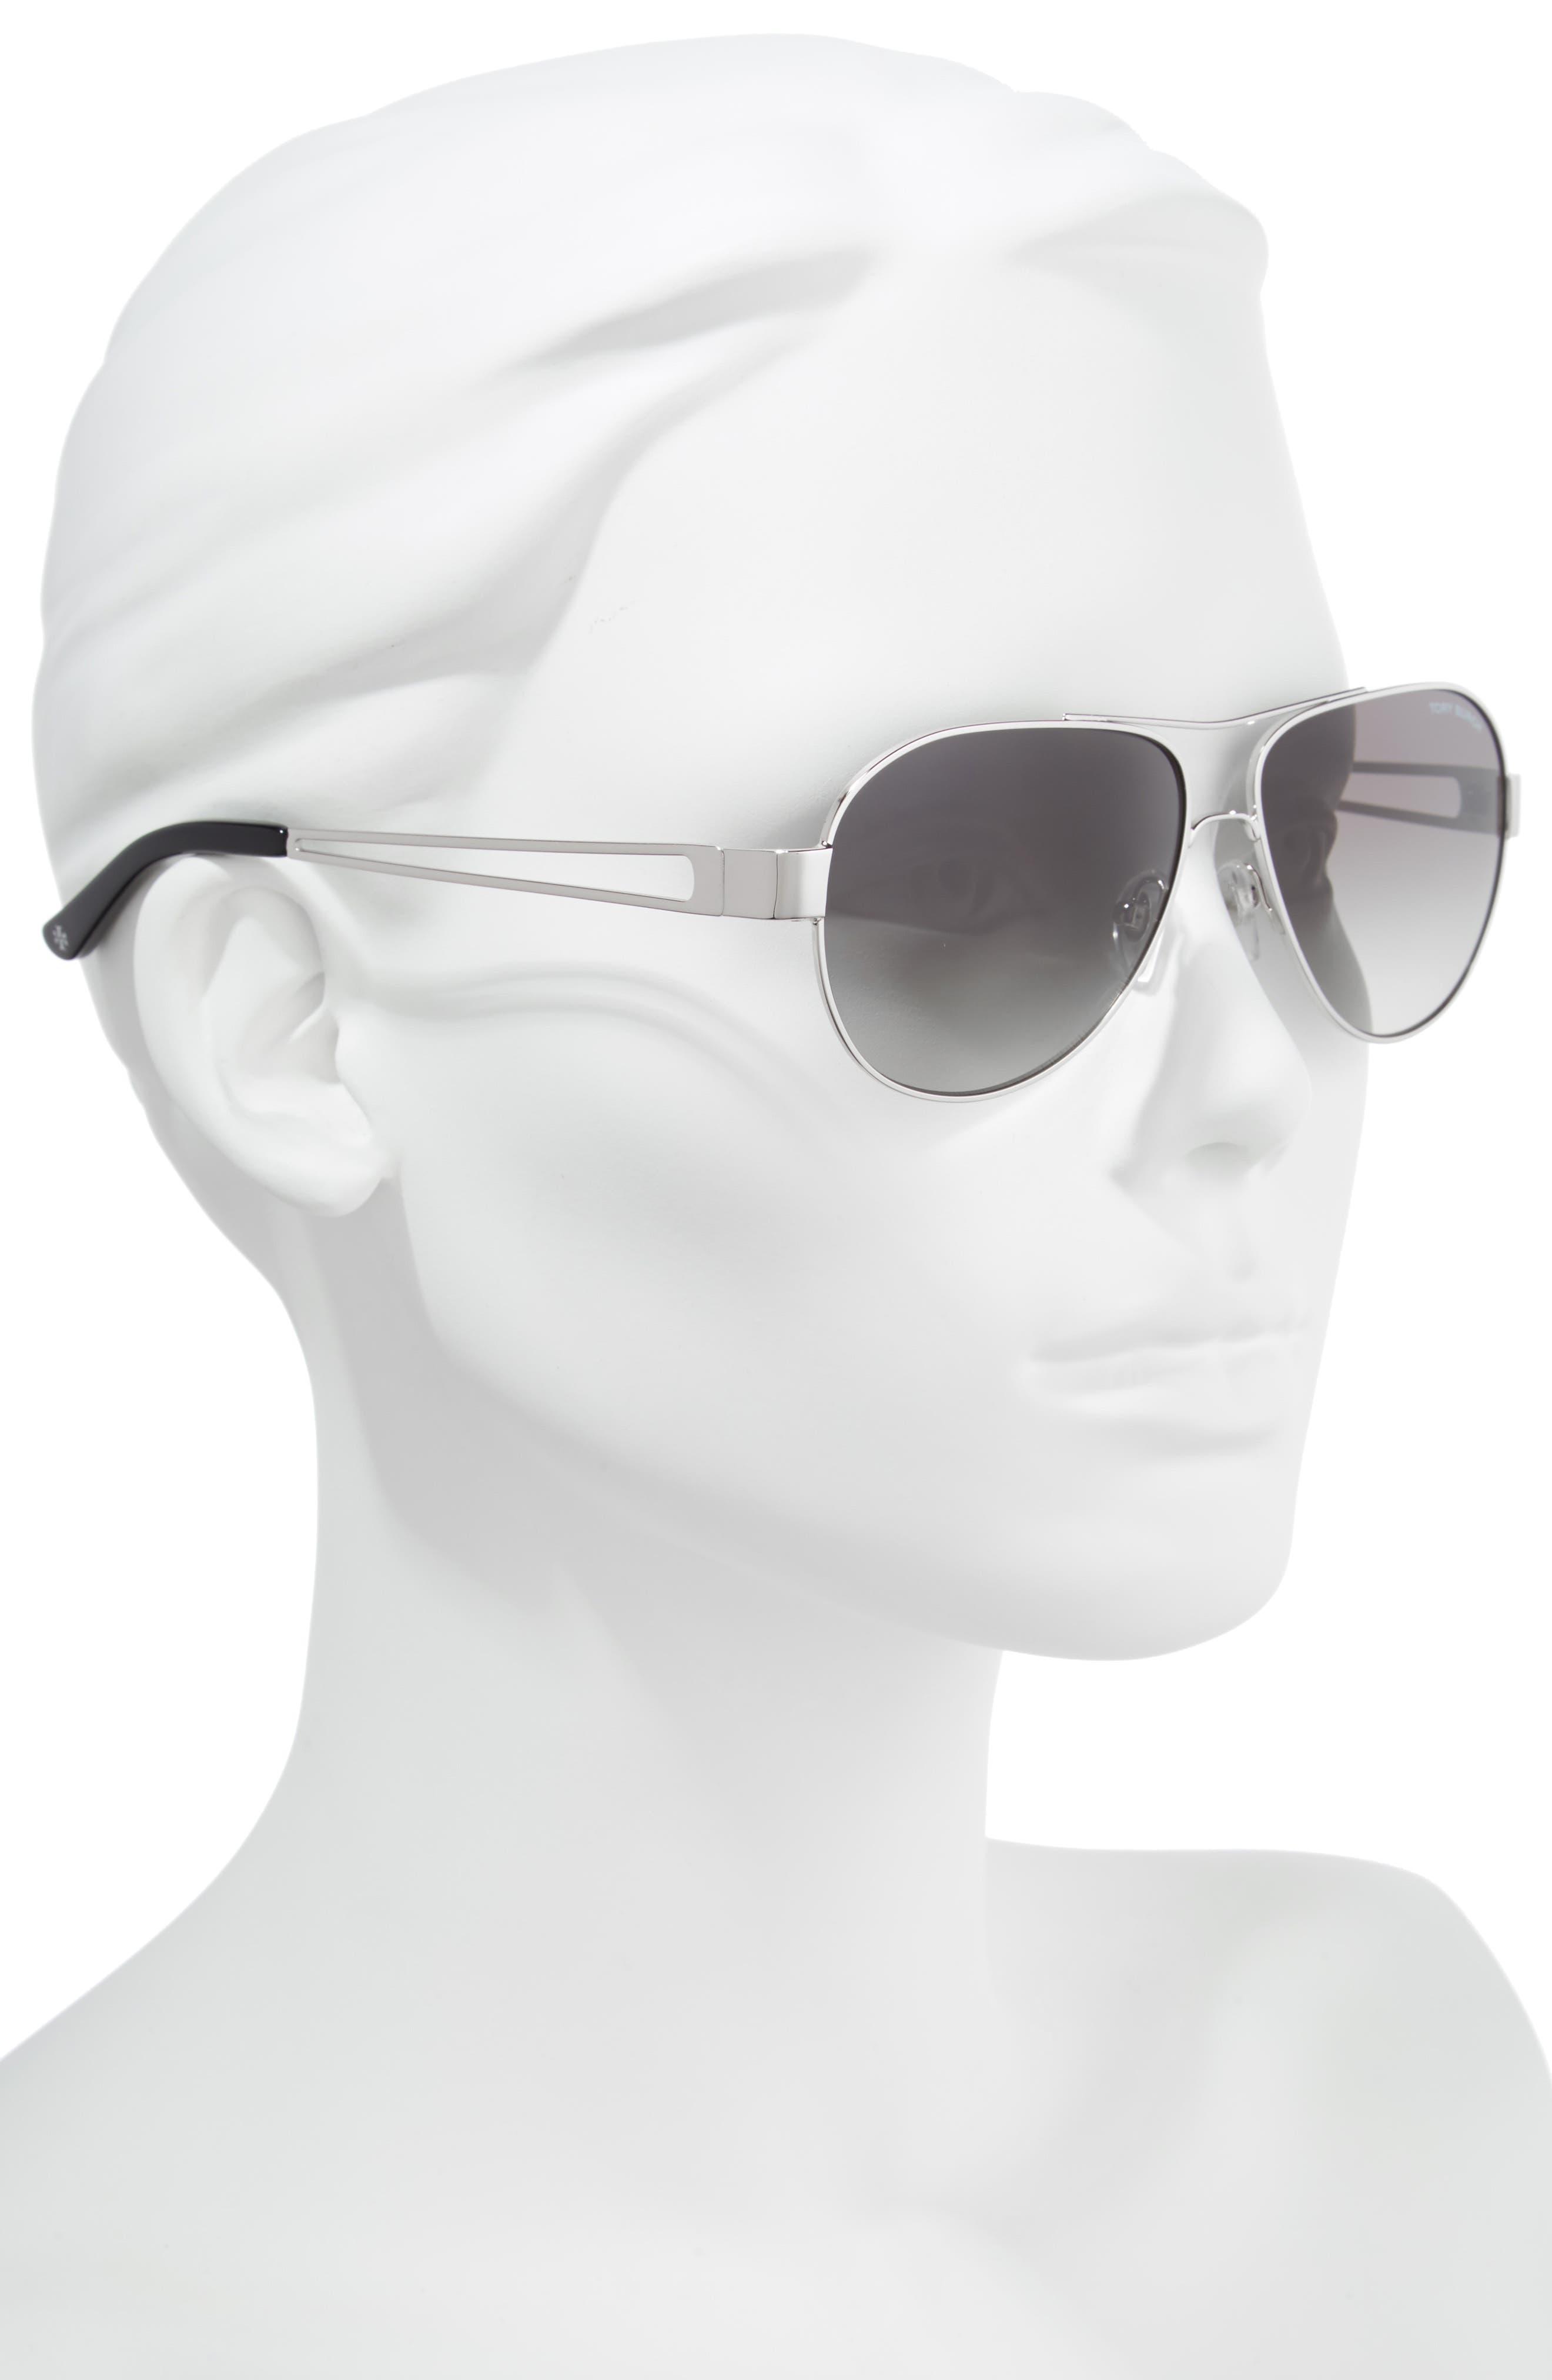 55mm Polarized Aviator Sunglasses,                             Alternate thumbnail 2, color,                             Silver/ Black Gradient